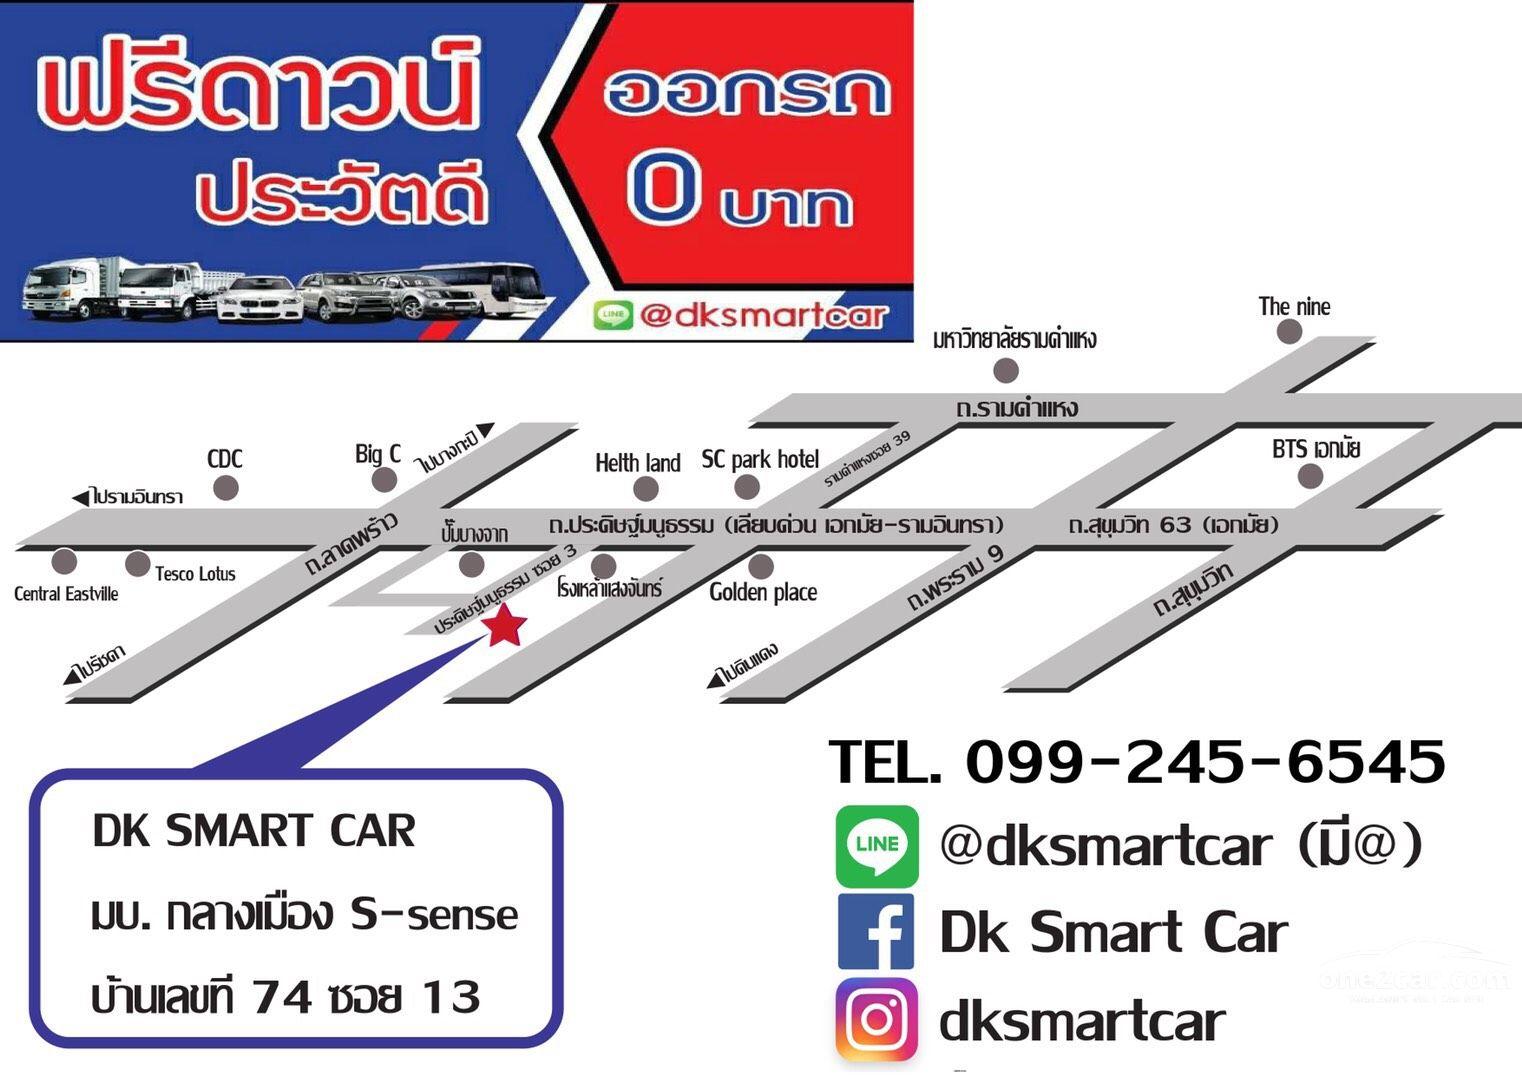 DK SMART CAR